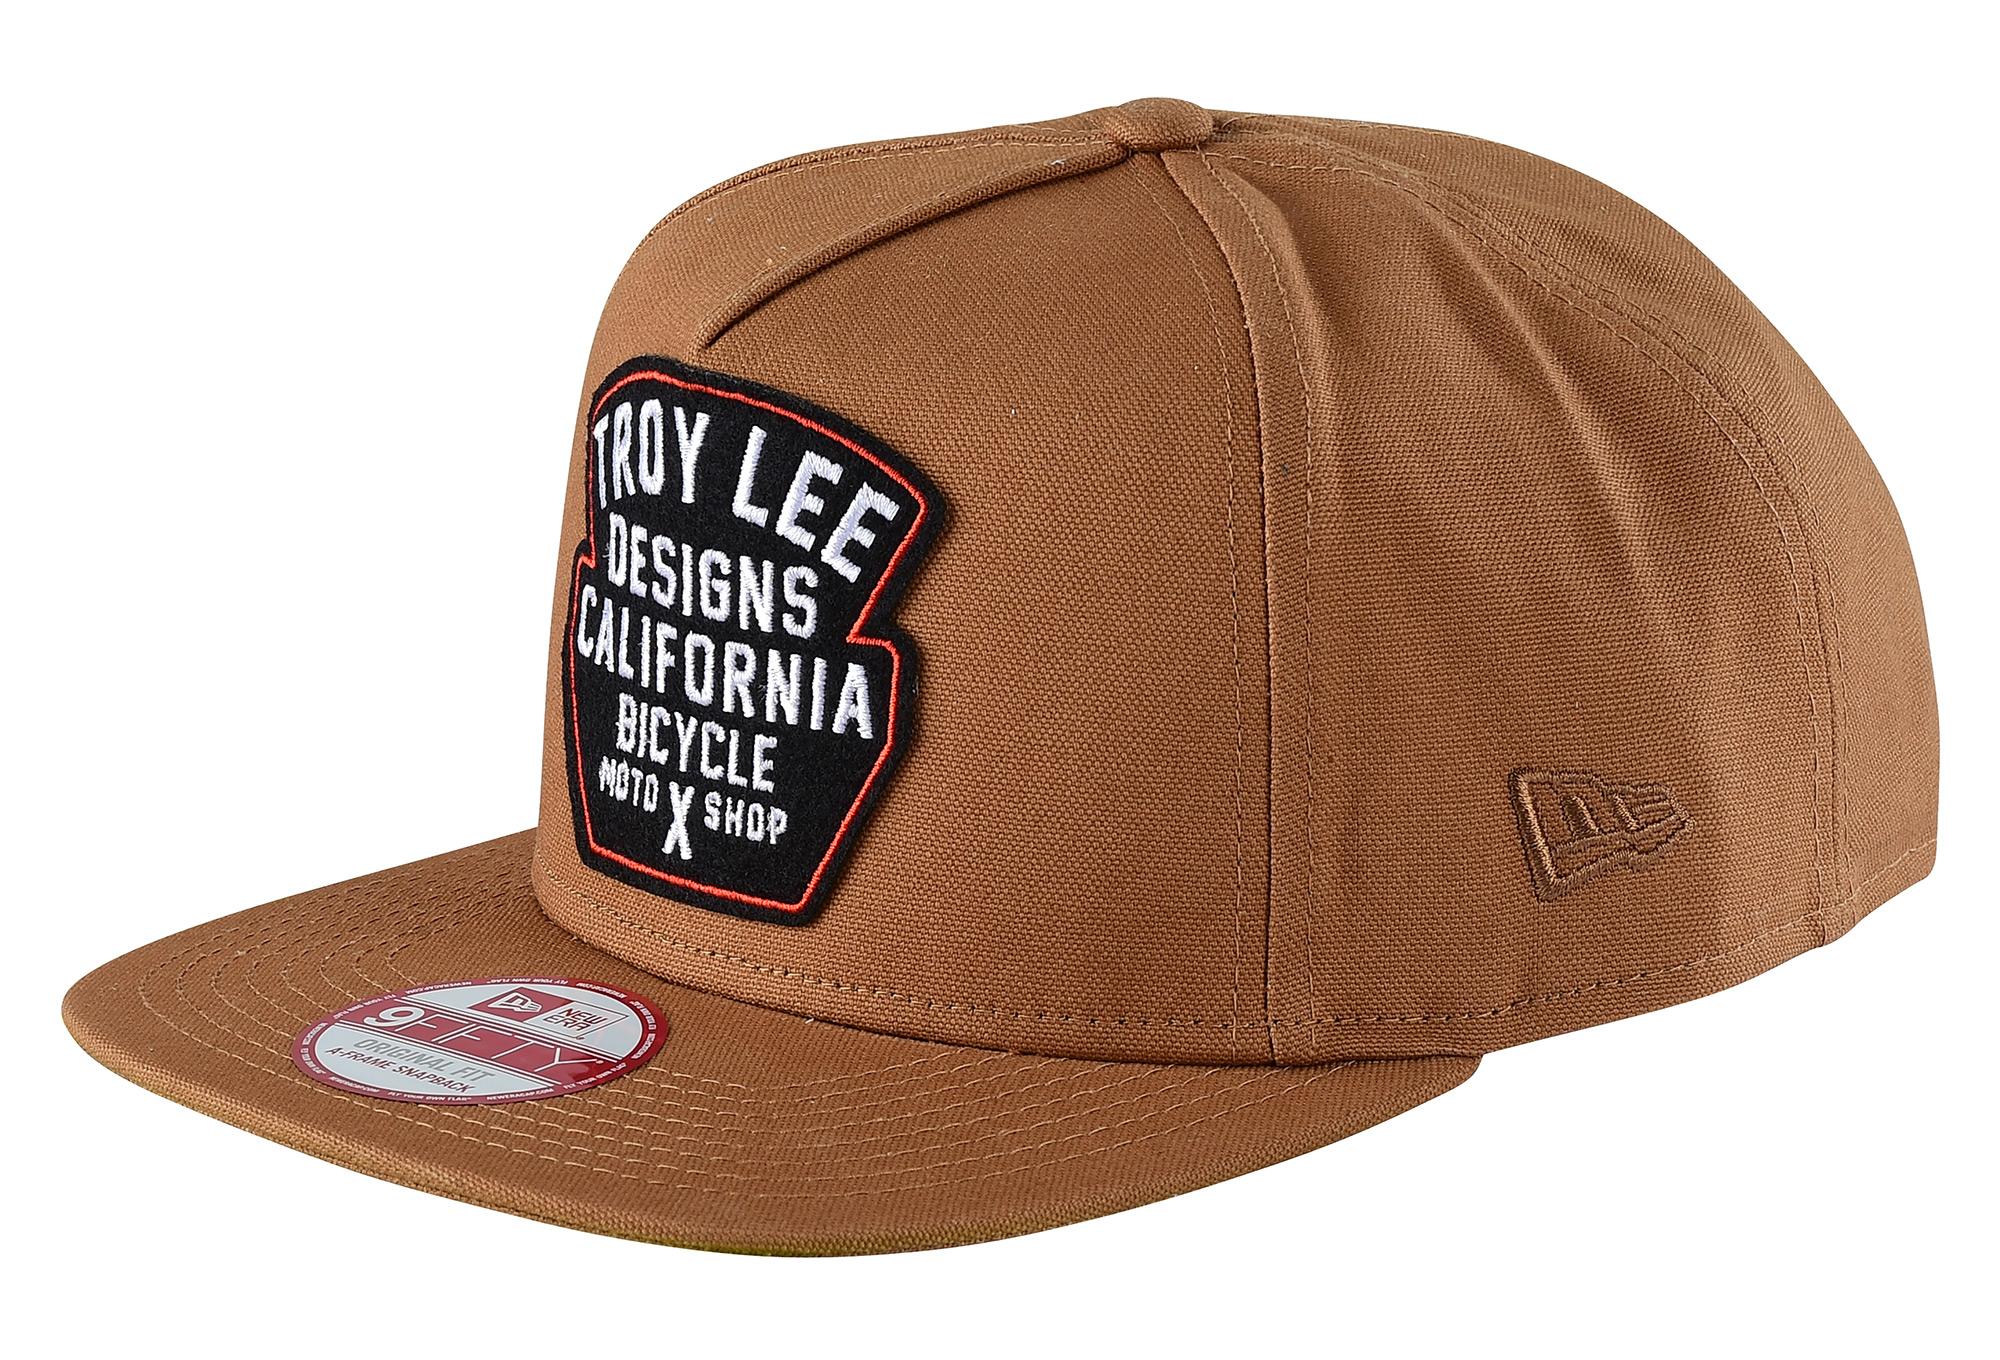 Troy Lee Designs Outback Cap Brown